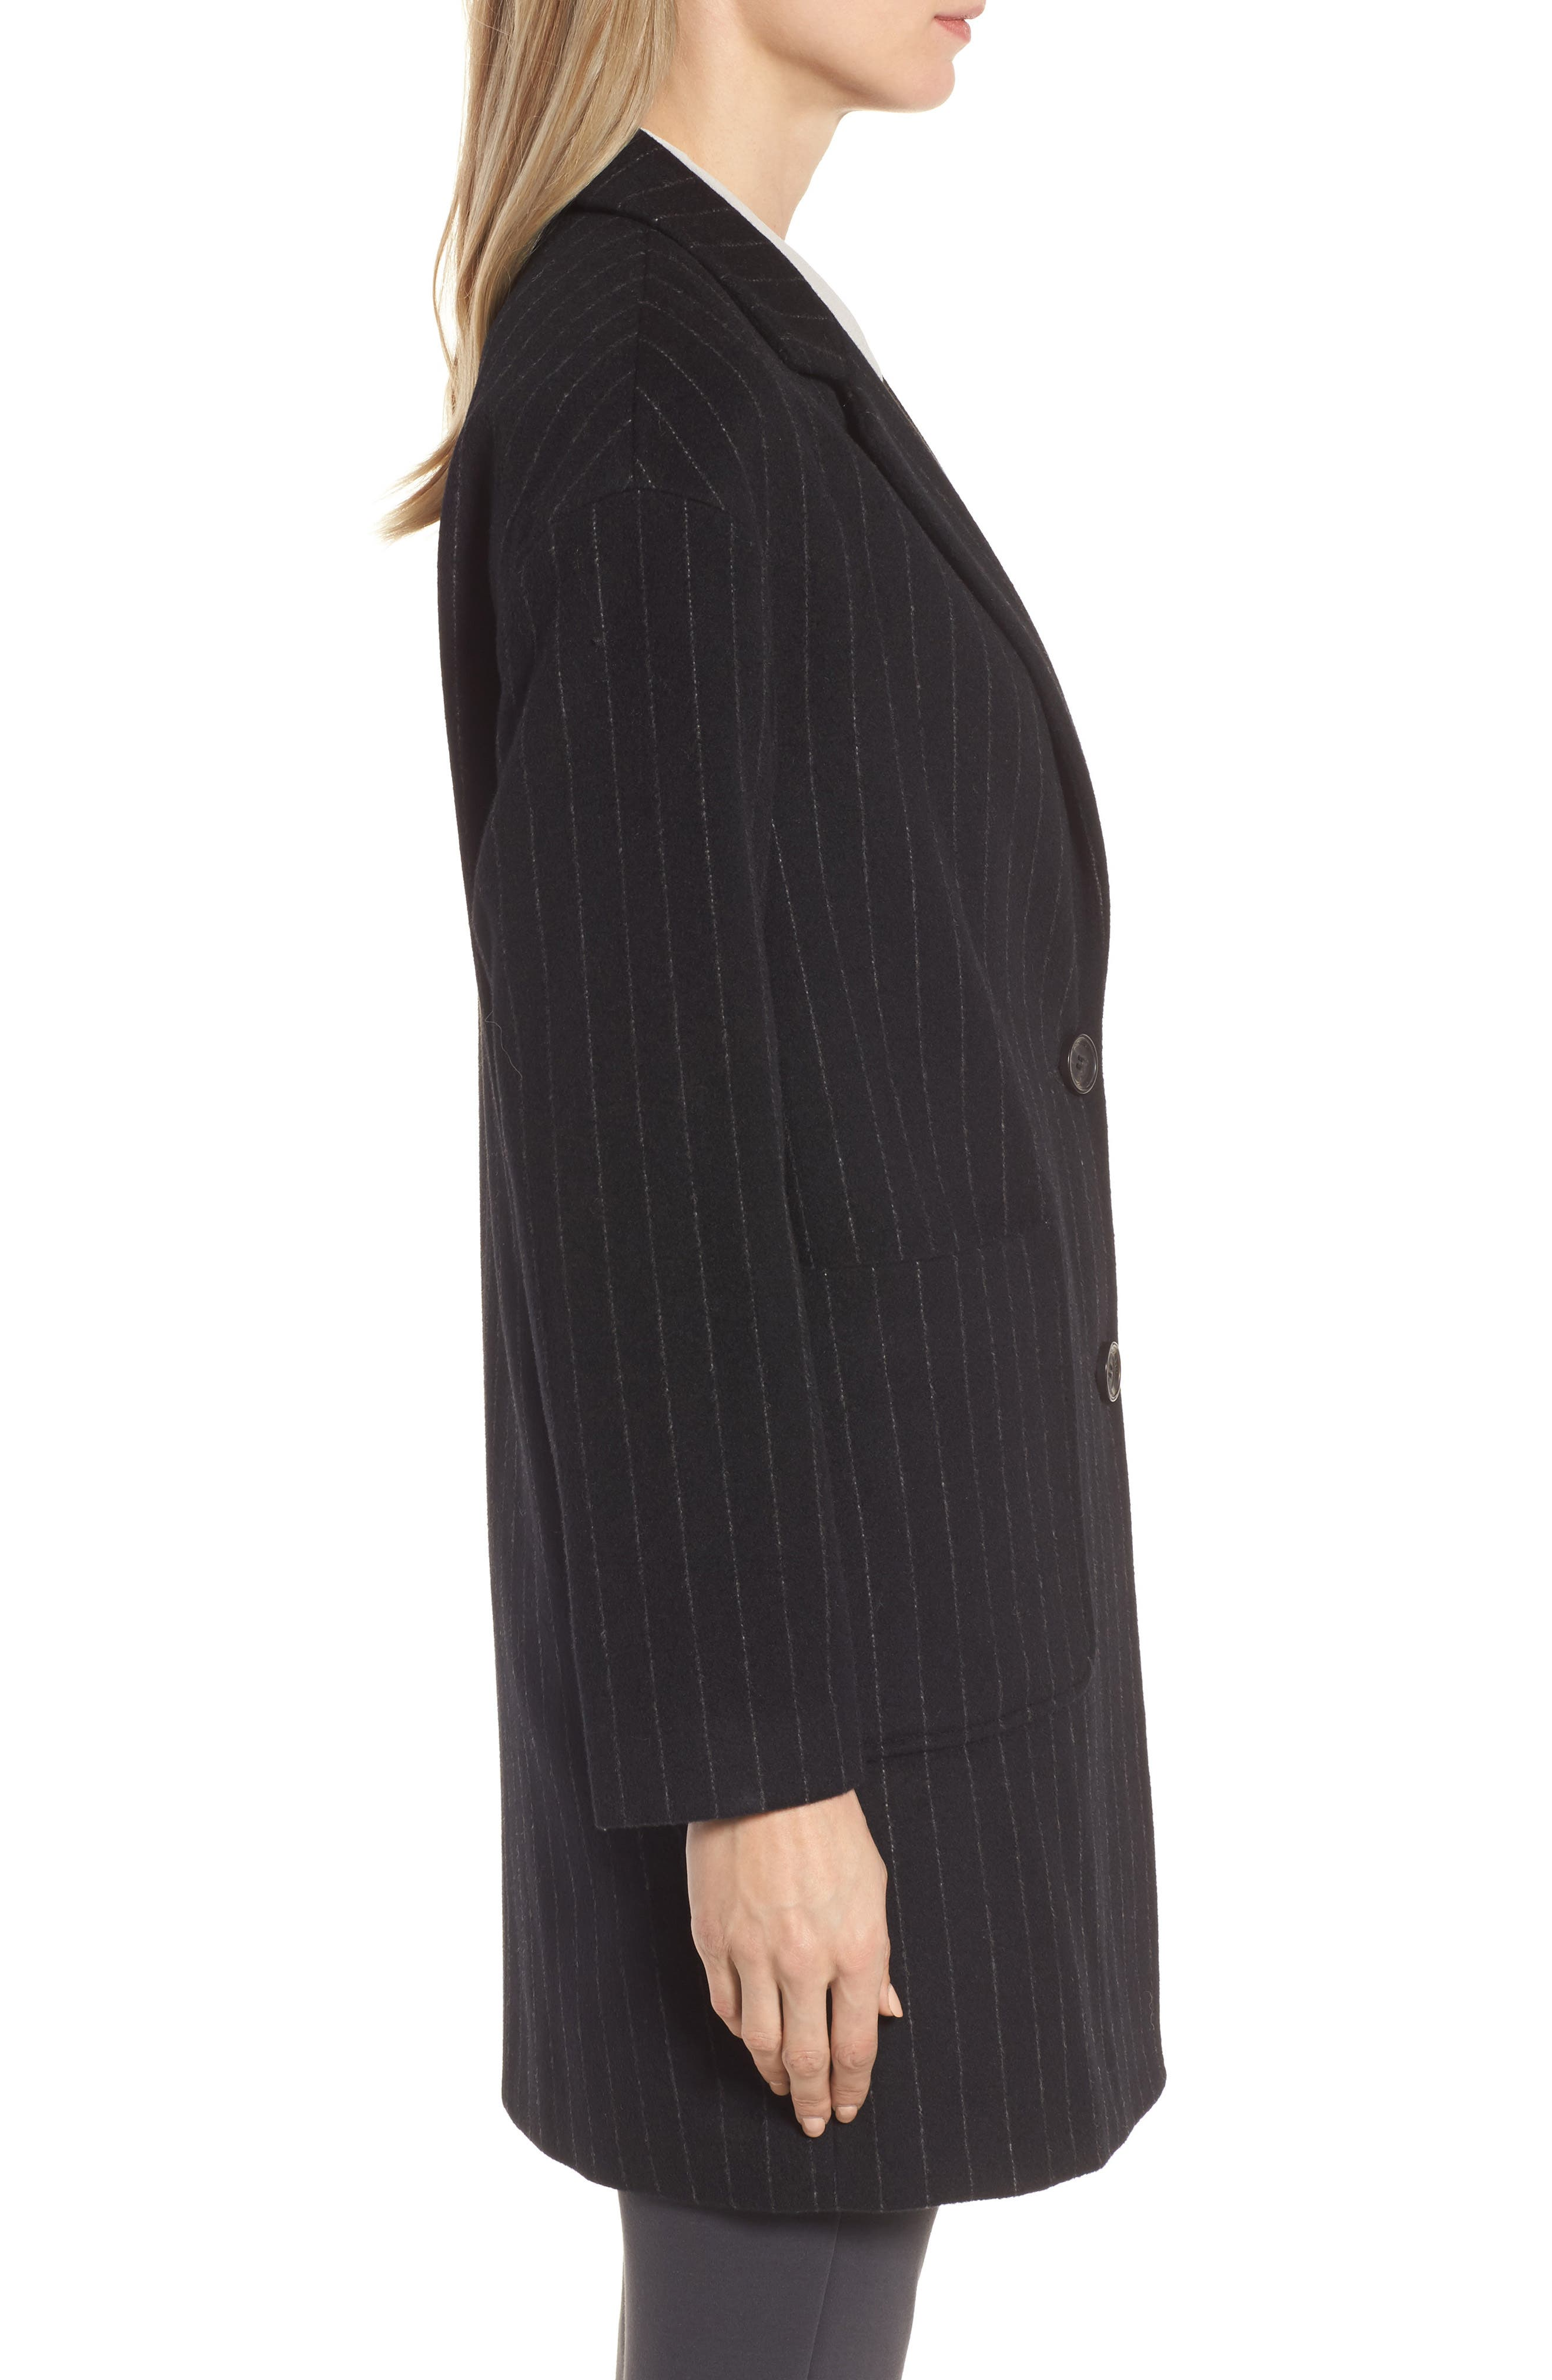 DKNY Pinstripe Wool Blend Coat,                             Alternate thumbnail 3, color,                             Black